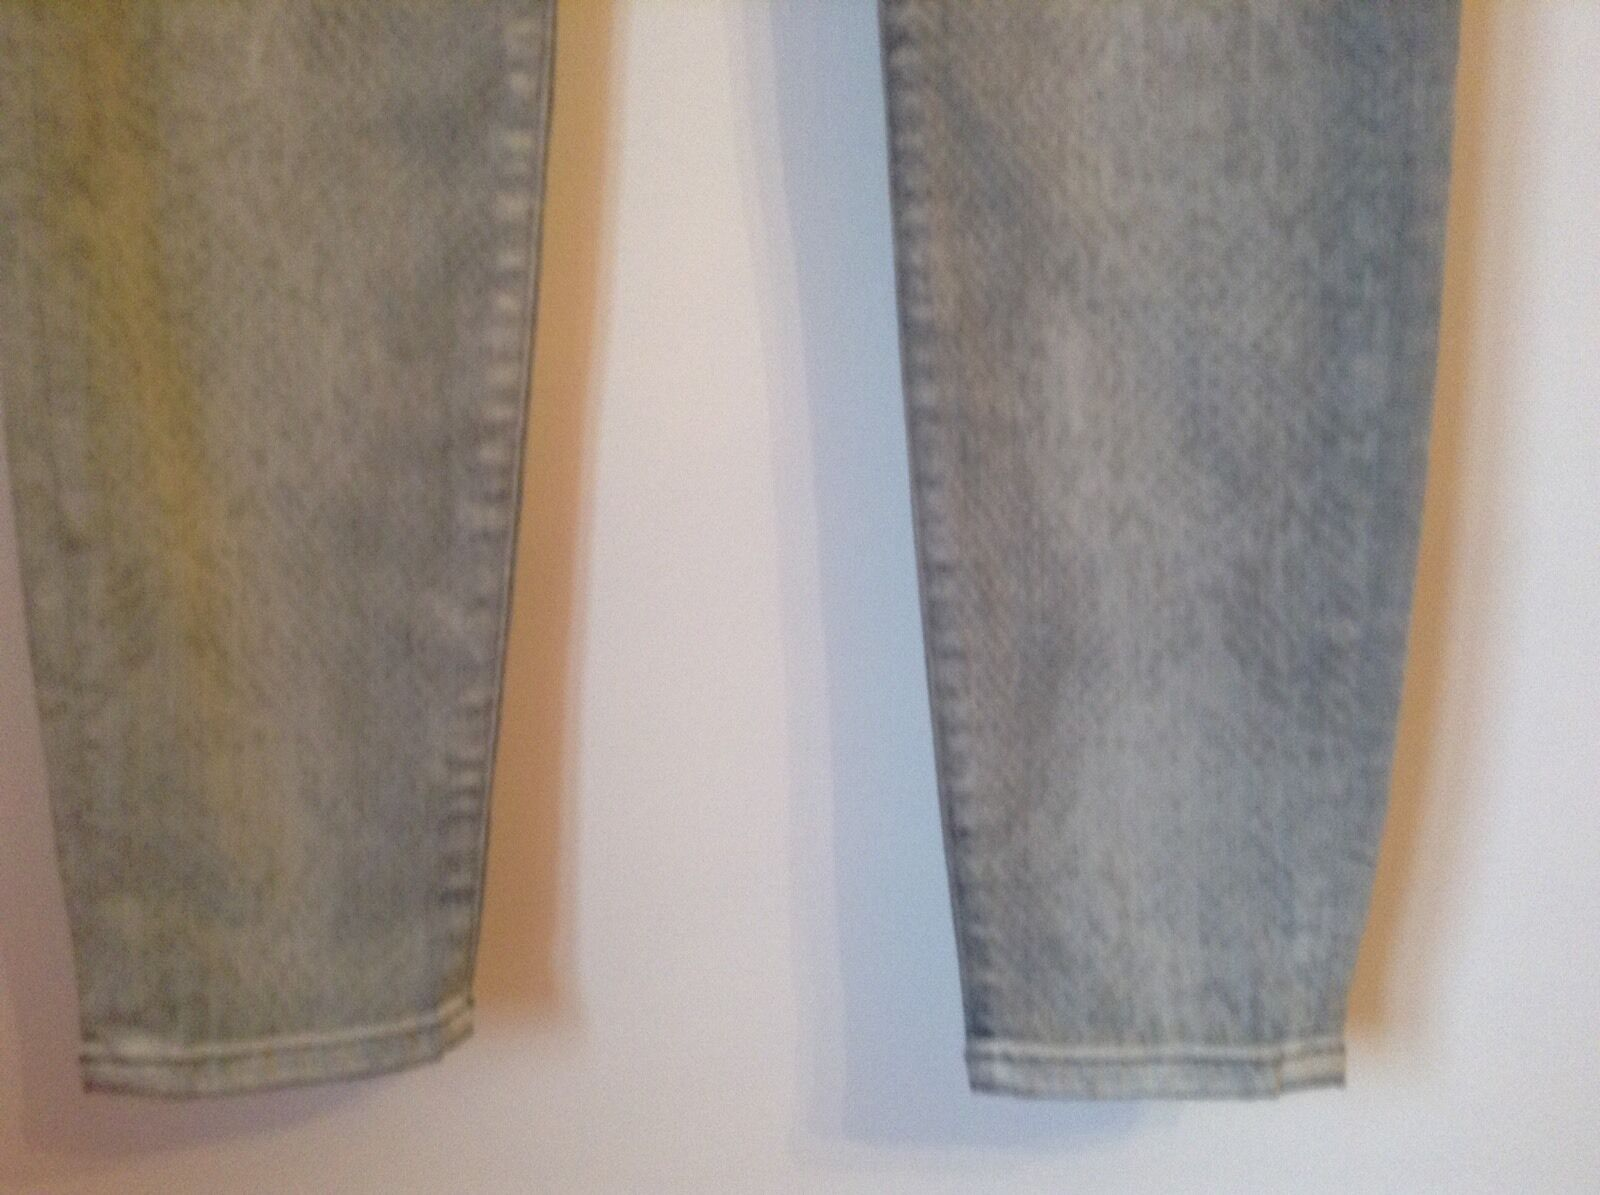 BNWT 100% auth 7 For All Mankind Ladies Laserot Snake Snake Snake Print Skinny jeans. 23 e5382d